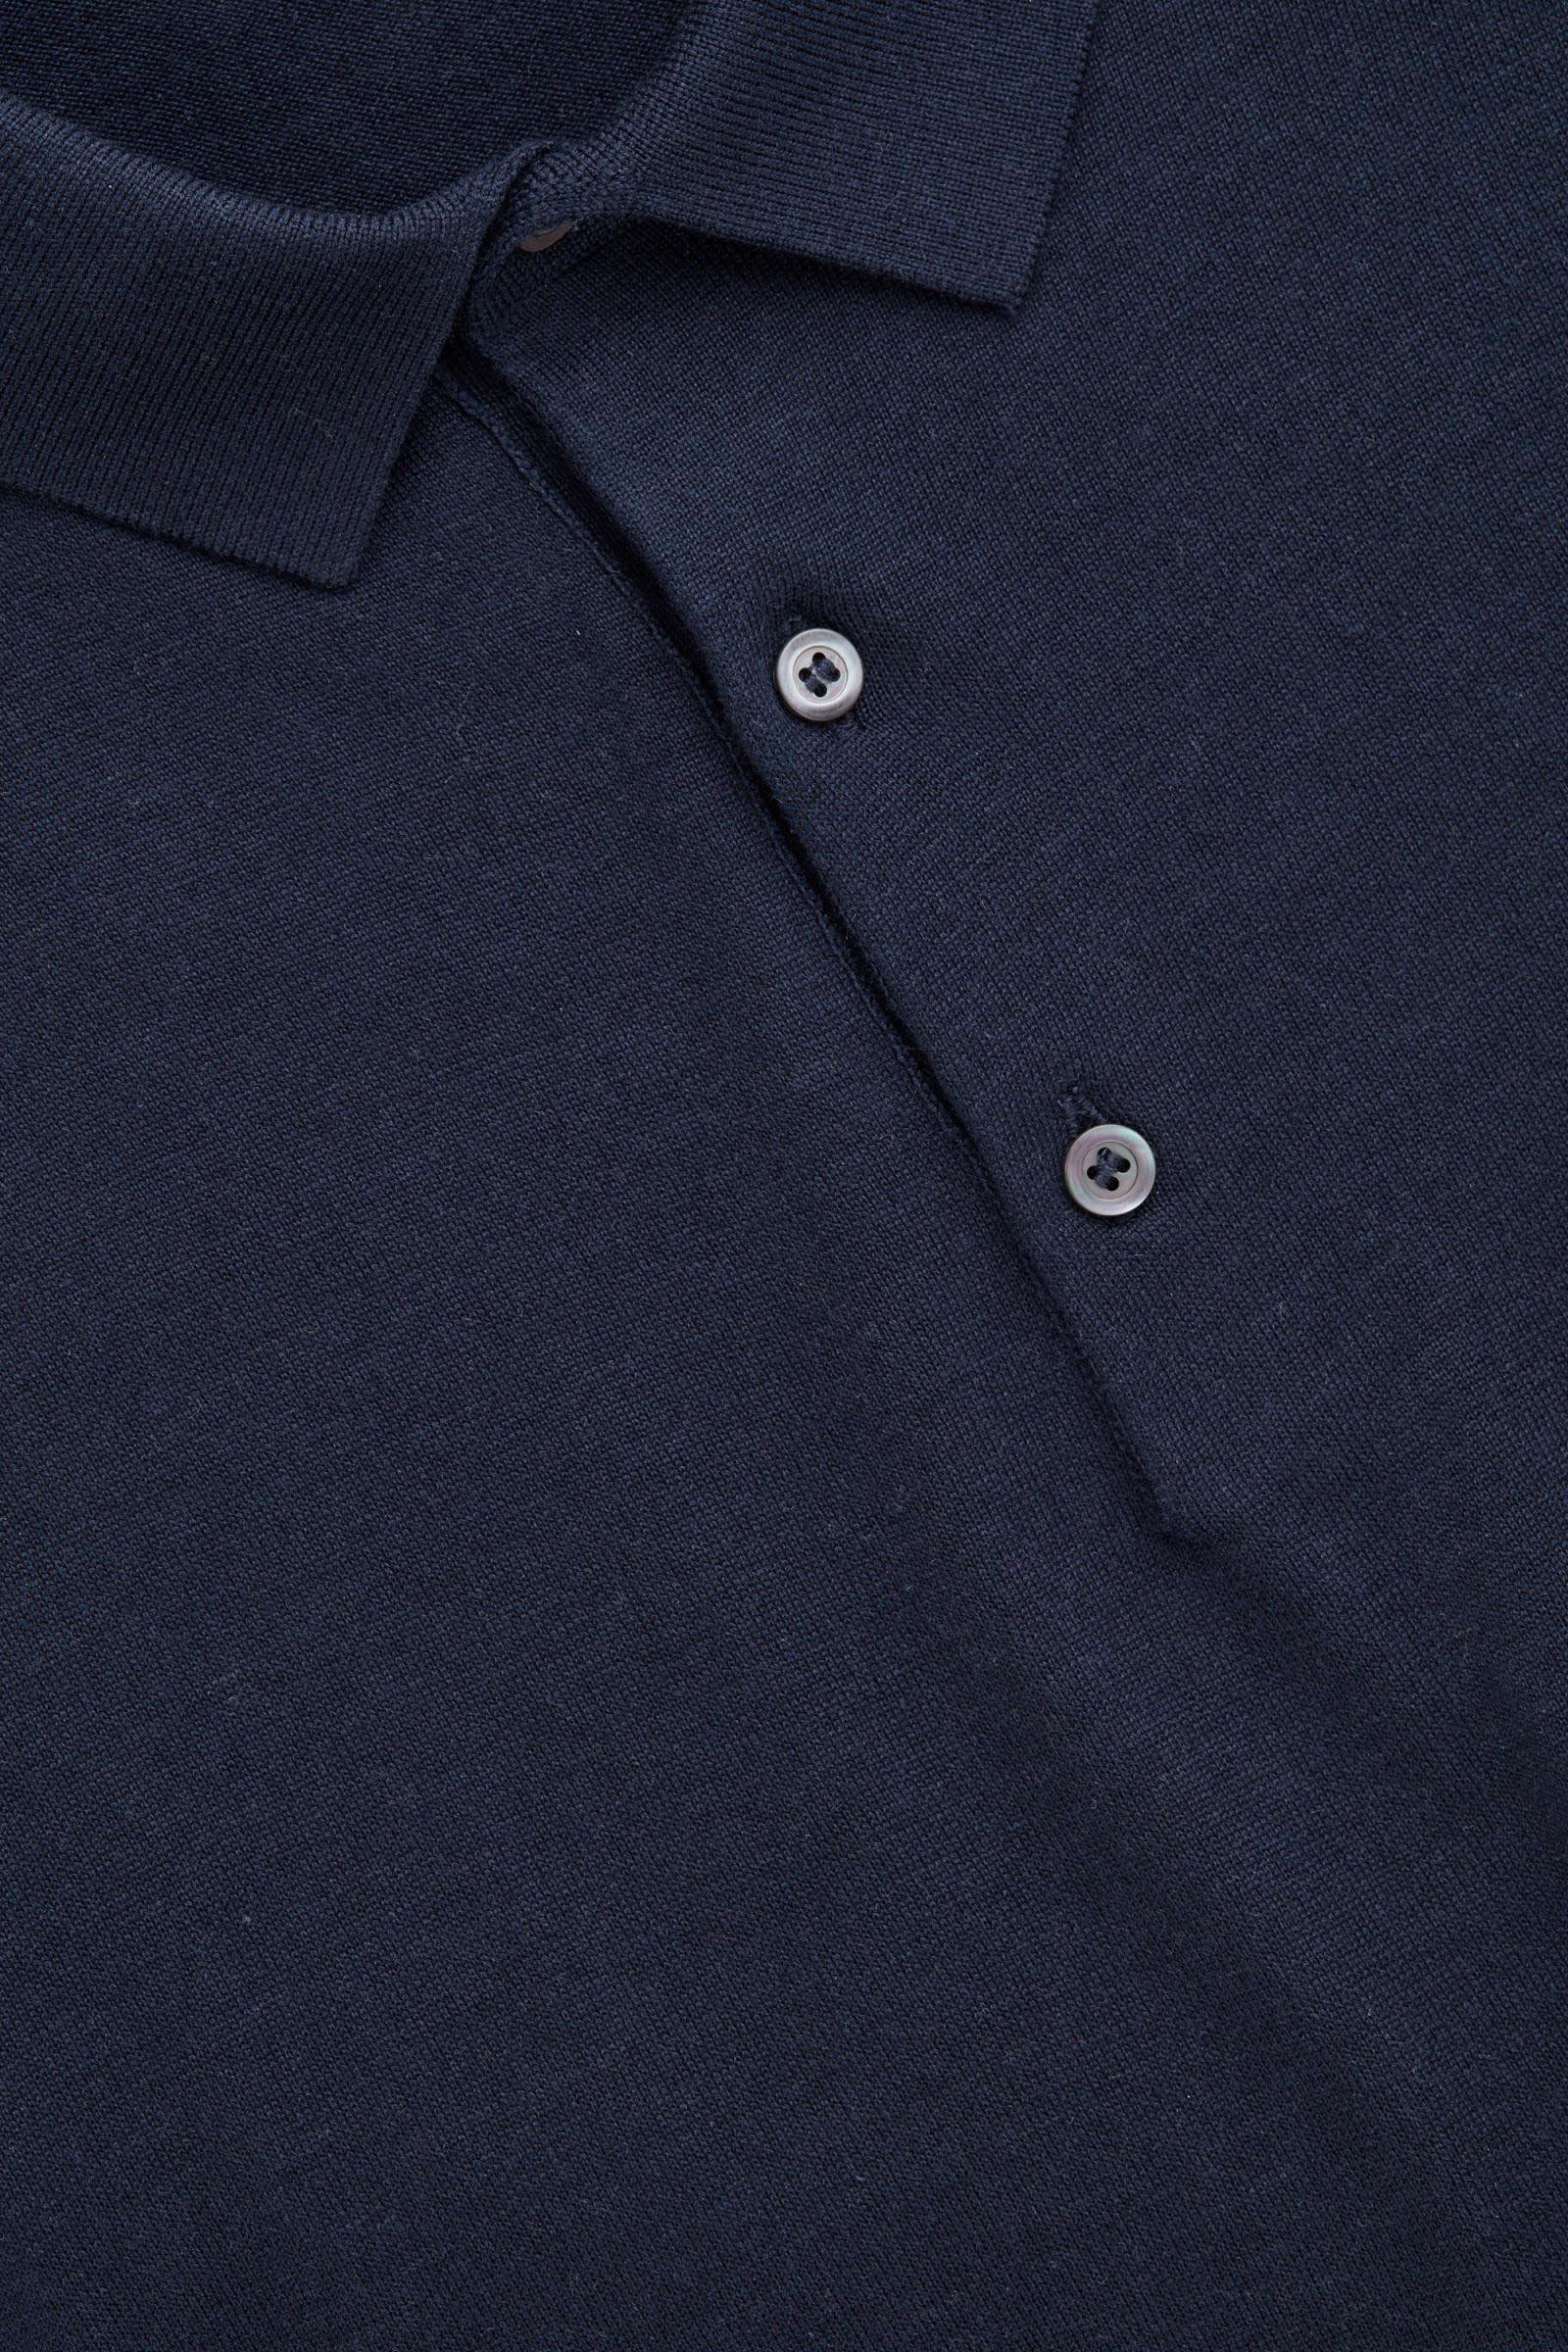 COS 실크 코튼 폴로 셔츠의 네이비컬러 상품컷입니다.